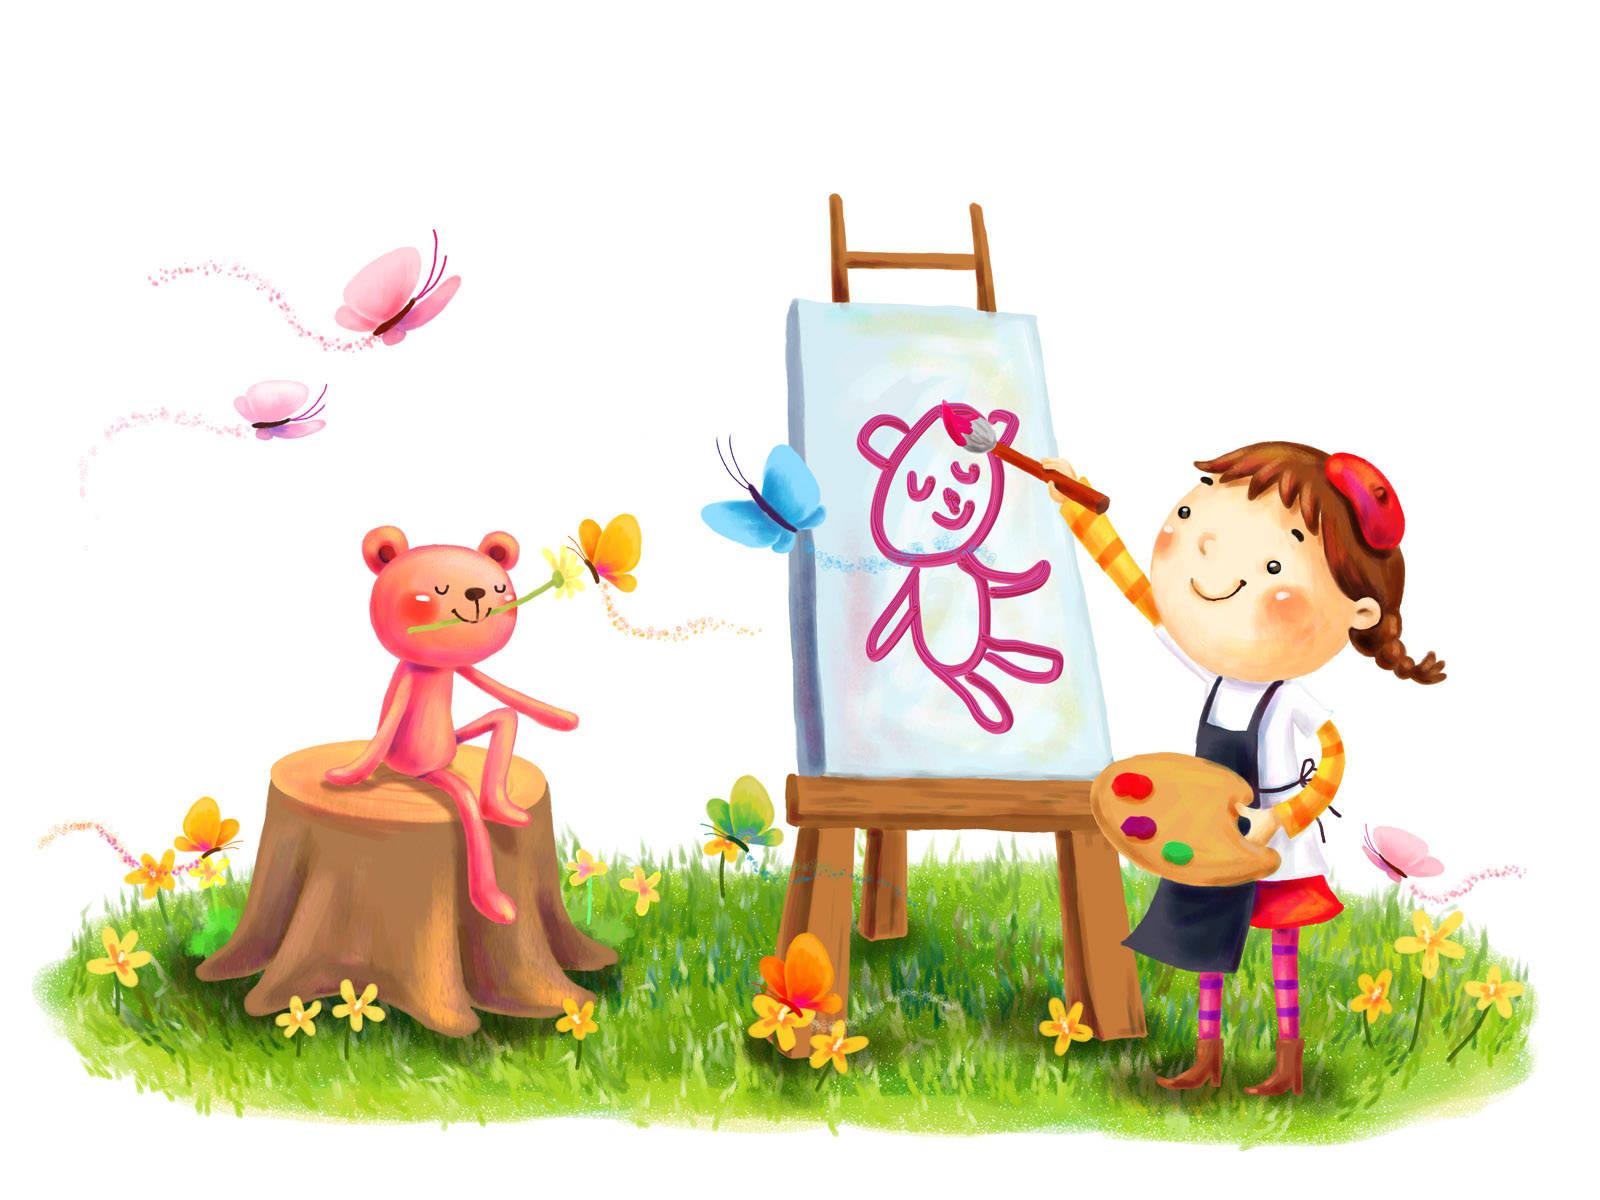 Beautiful Cartoon Children Hd Image Wallpaper